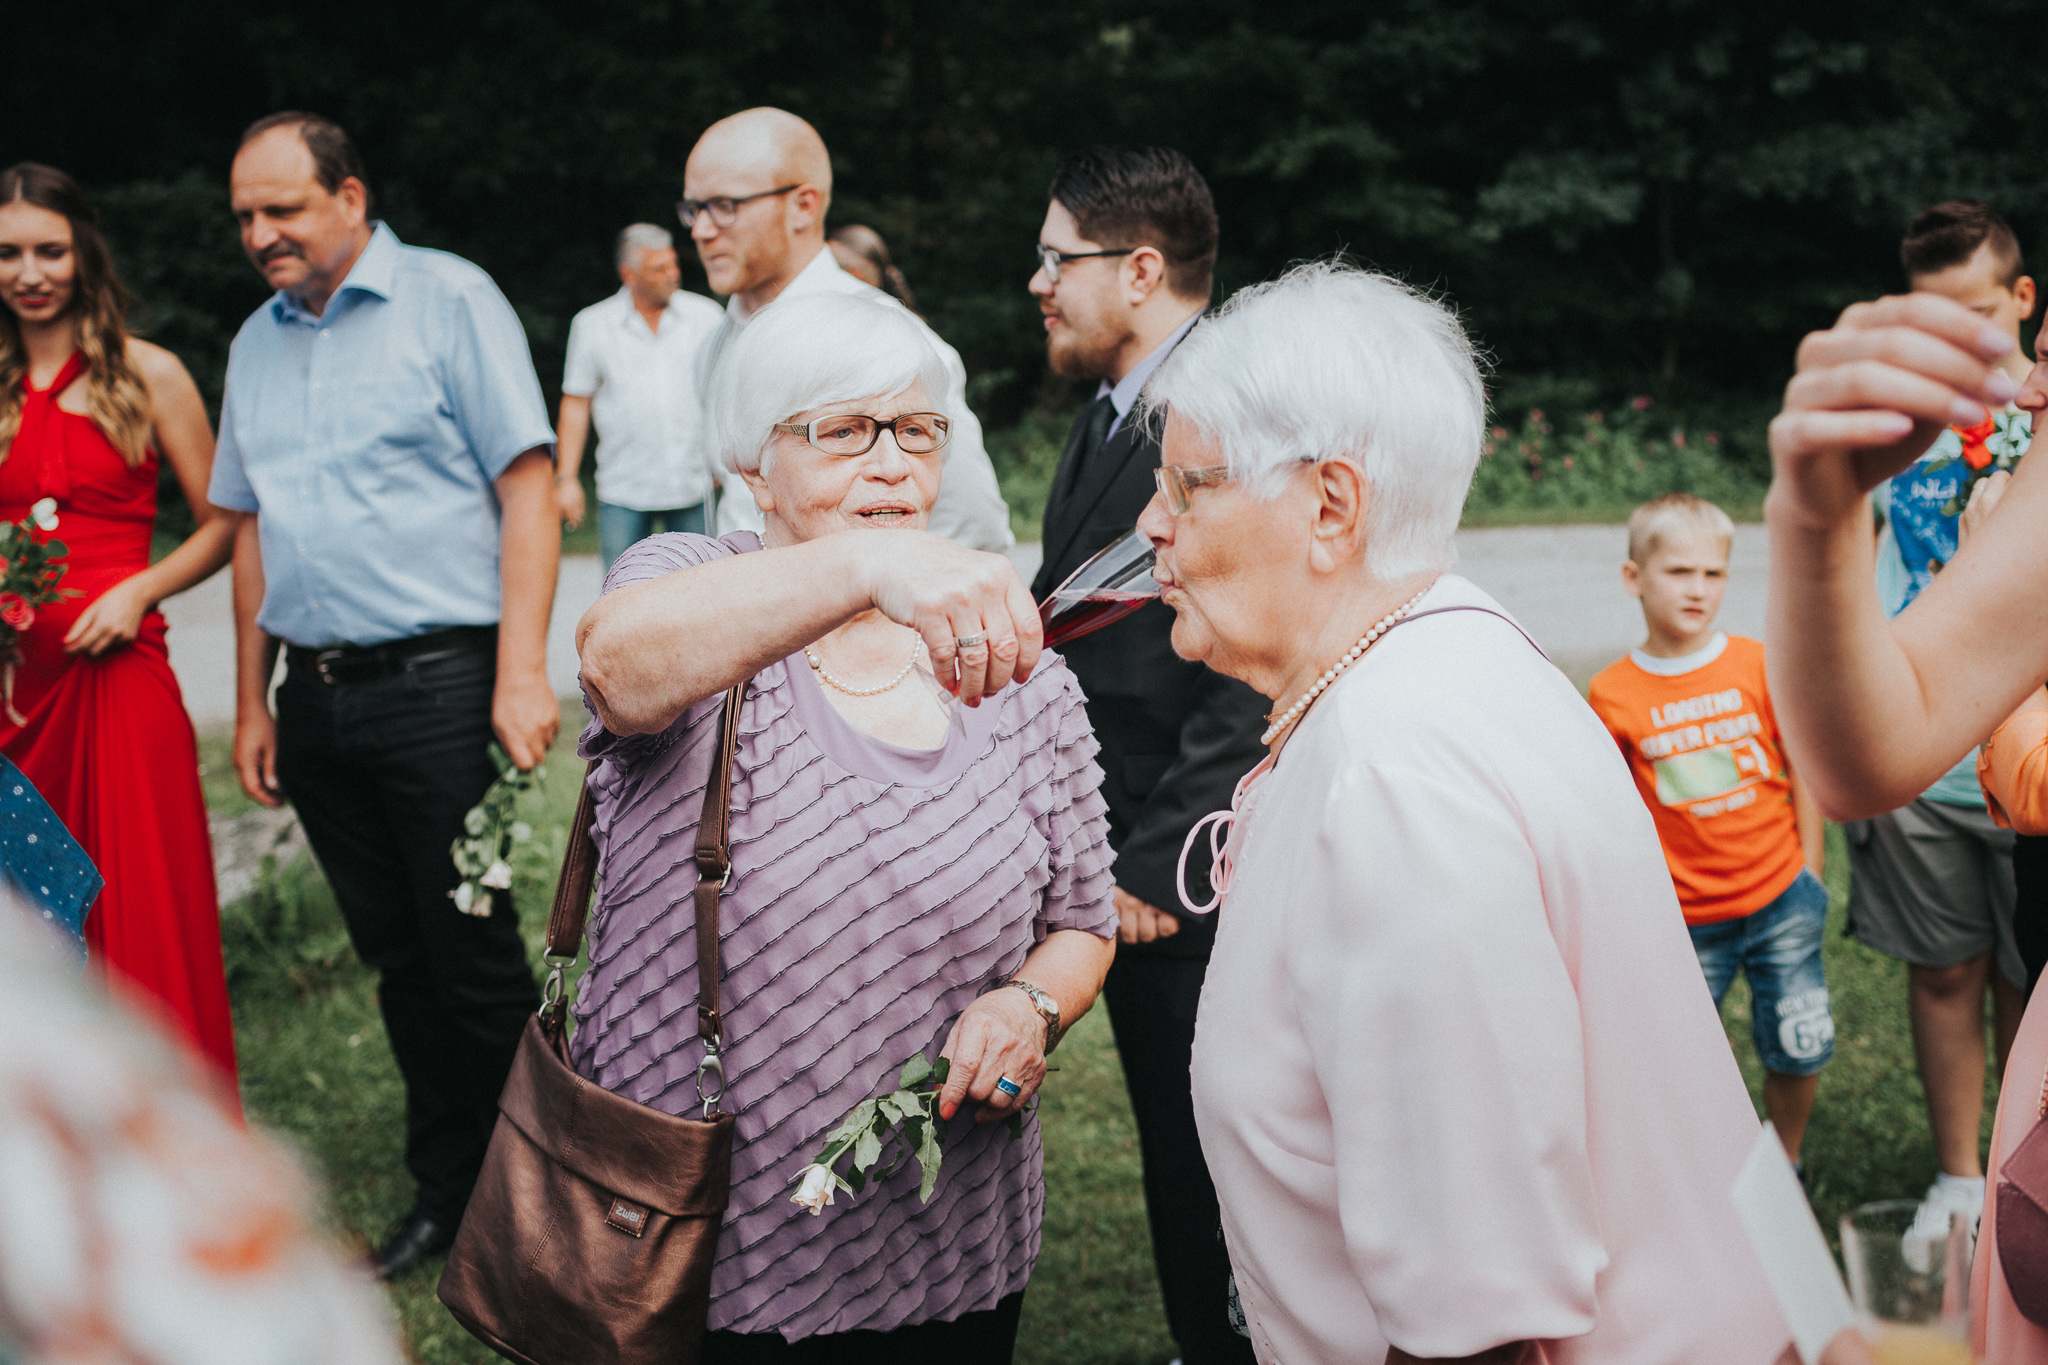 Hochzeitsfotograf-Seck-23.jpg